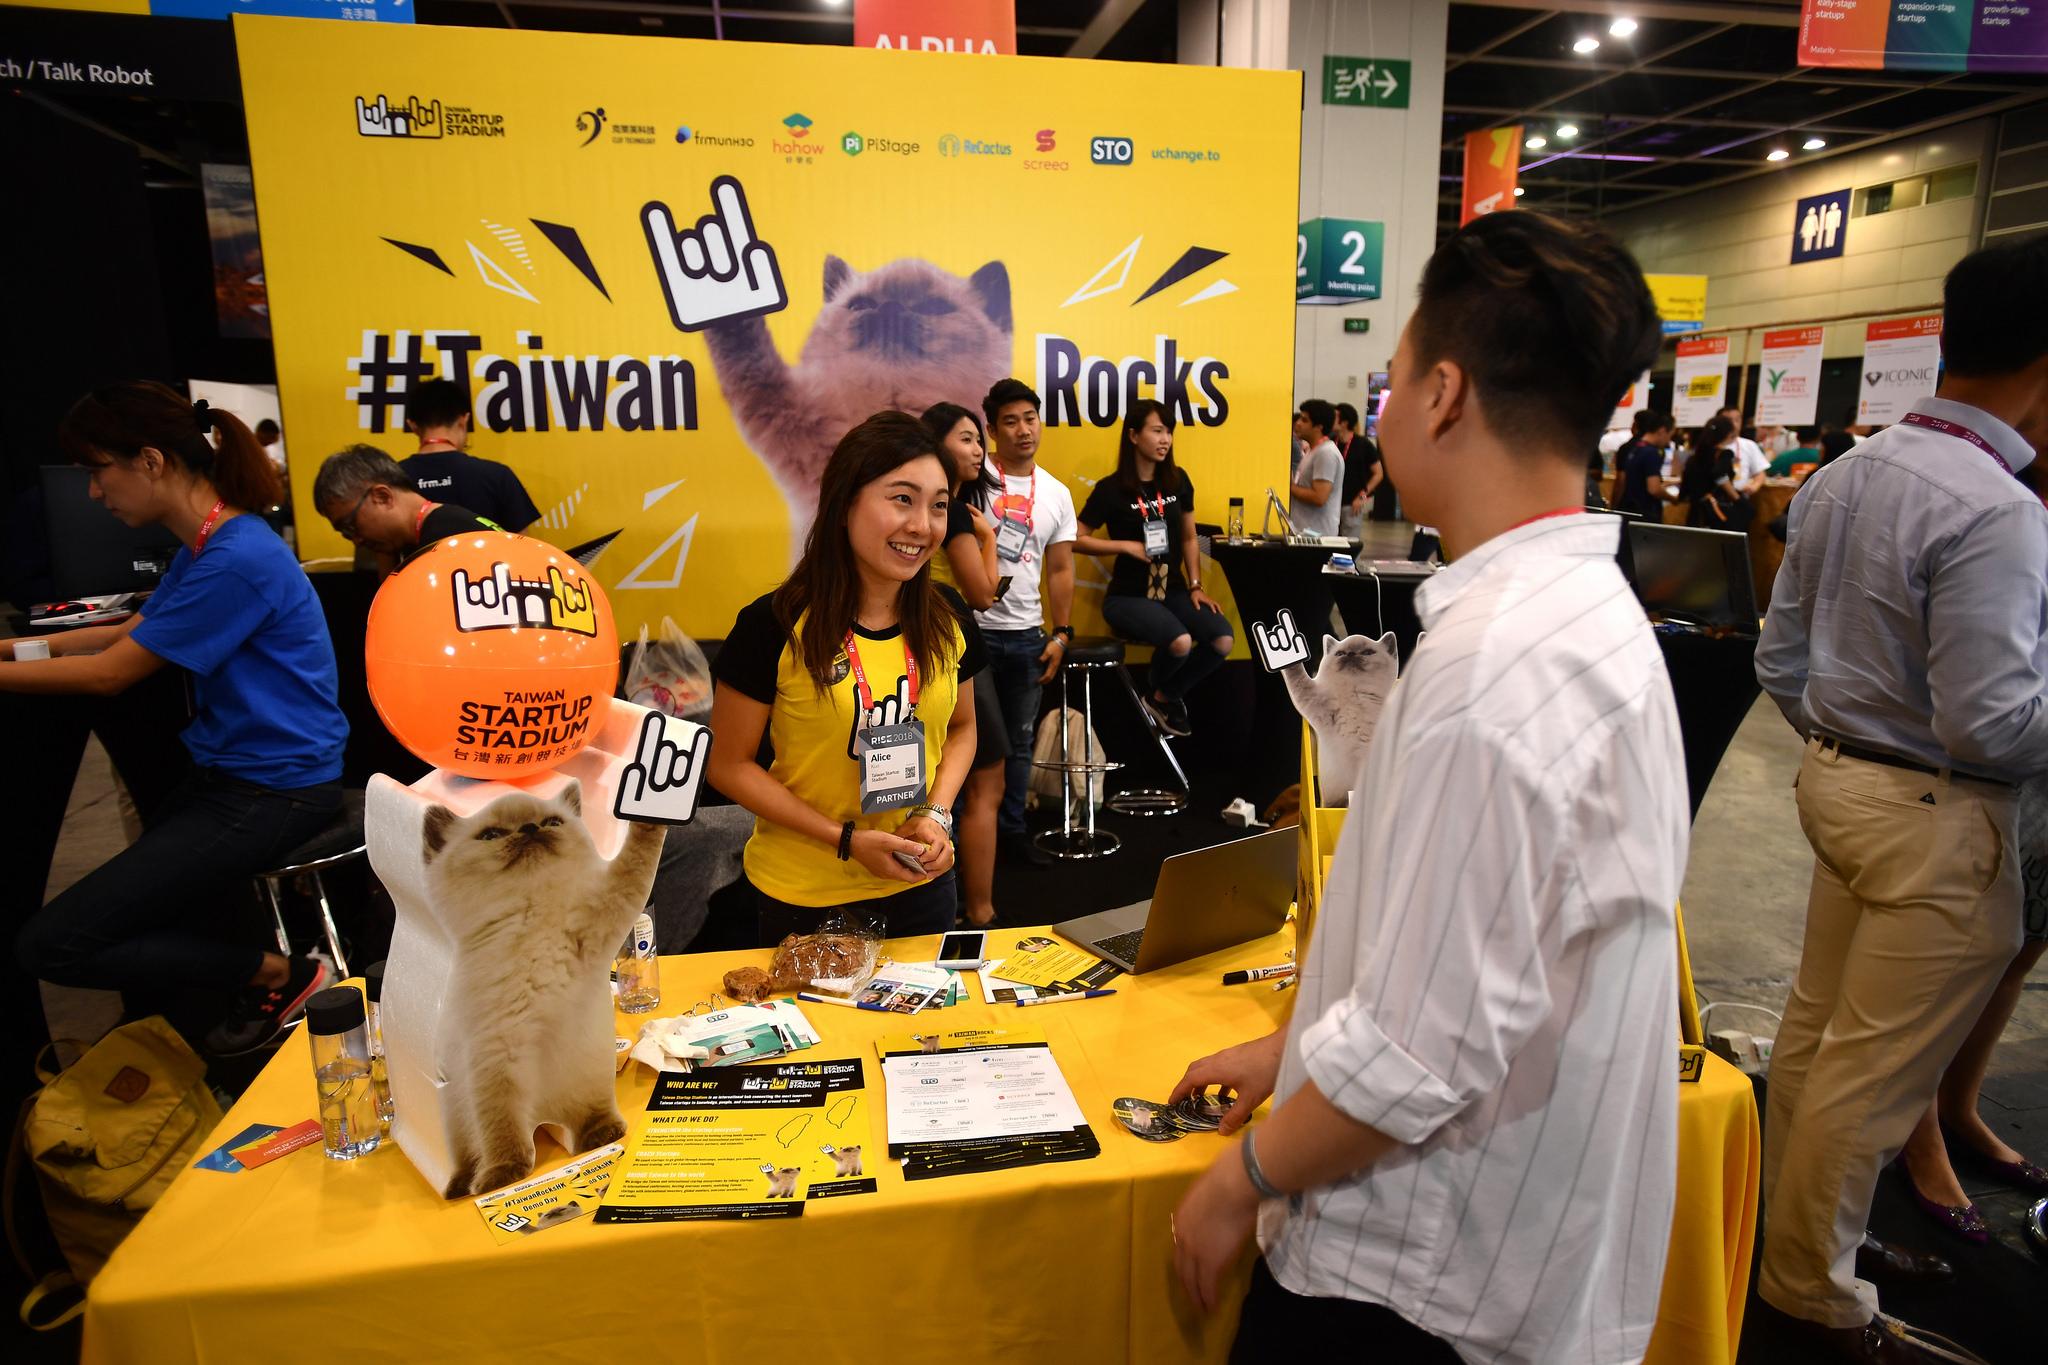 Taiwan Startup Stadium sets up shop at RISE Hong Kong, a tech startup exhibition. Photo courtesy of  RISE .